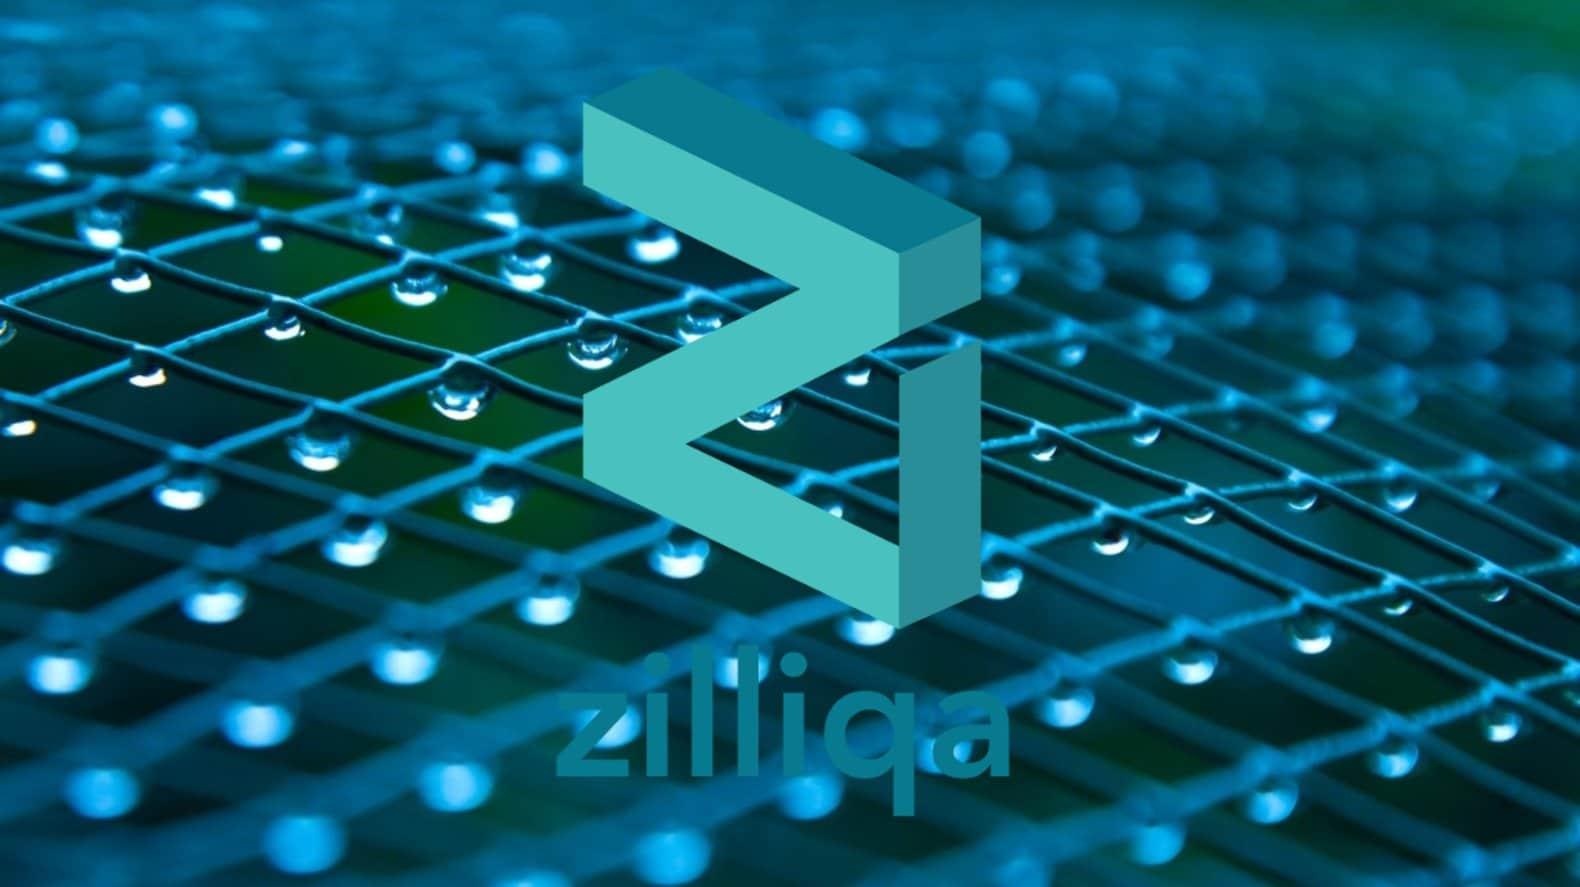 ZIlliqa: annunciati i vincitori dell'hackathon XSGD